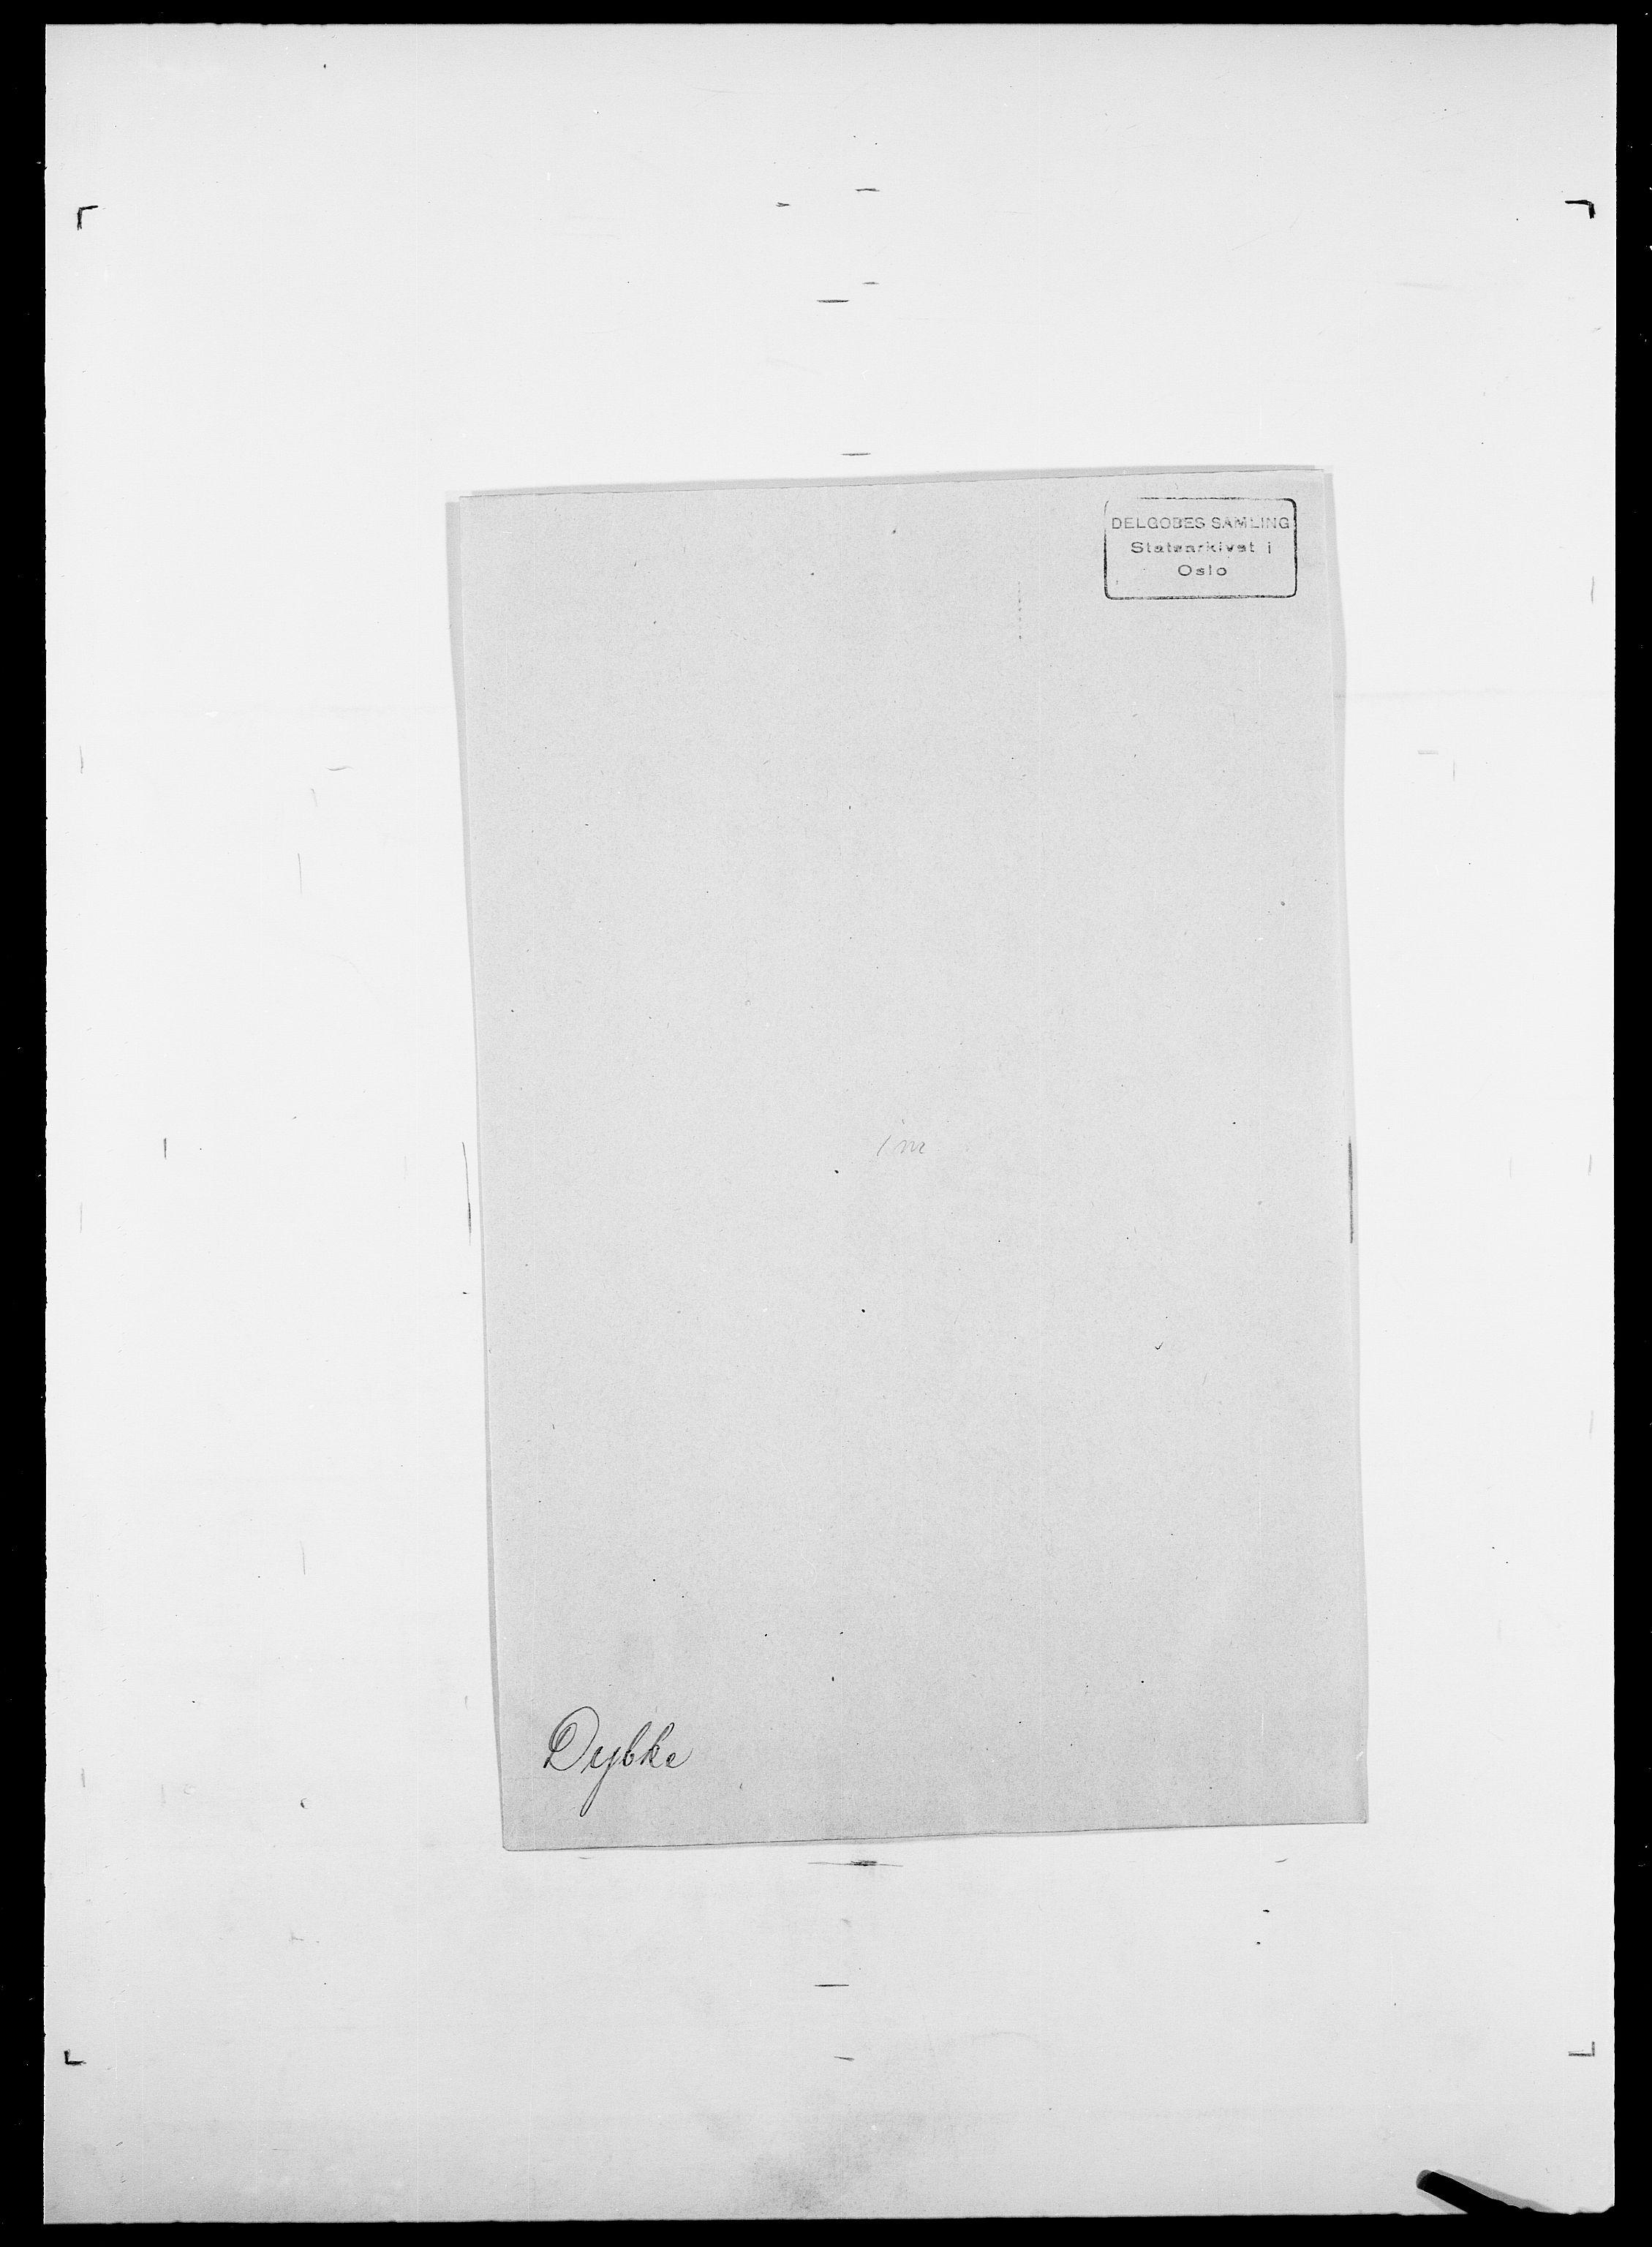 SAO, Delgobe, Charles Antoine - samling, D/Da/L0009: Dahl - v. Düren, s. 887